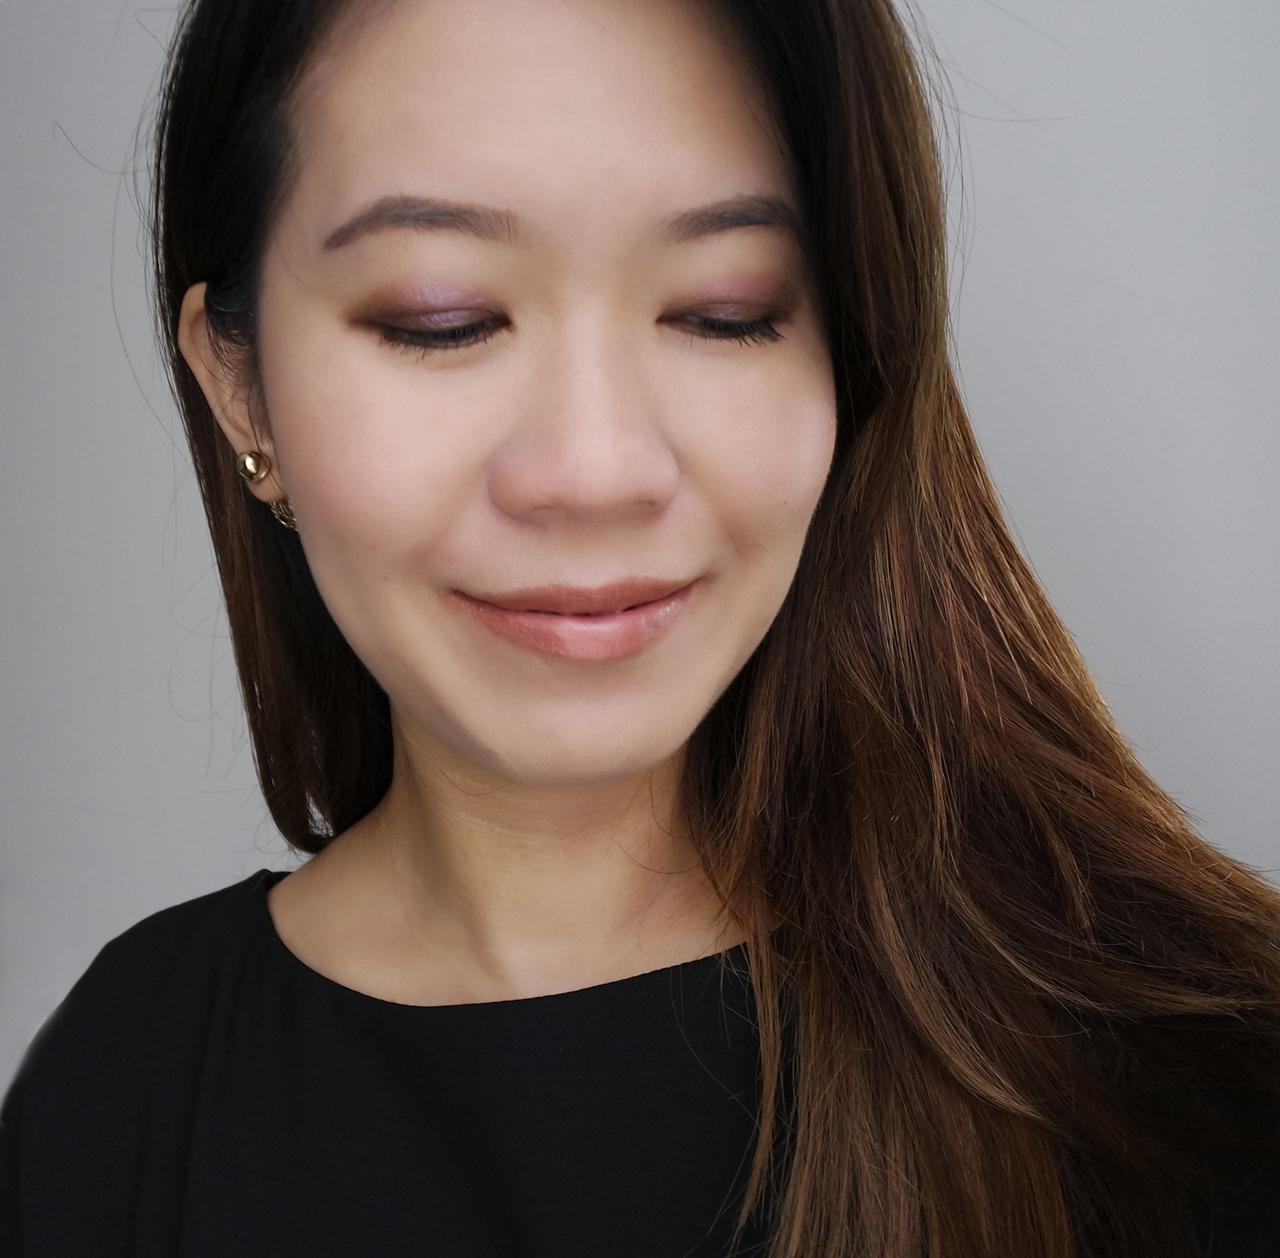 RMK Color Change Spring 2017 makeup look